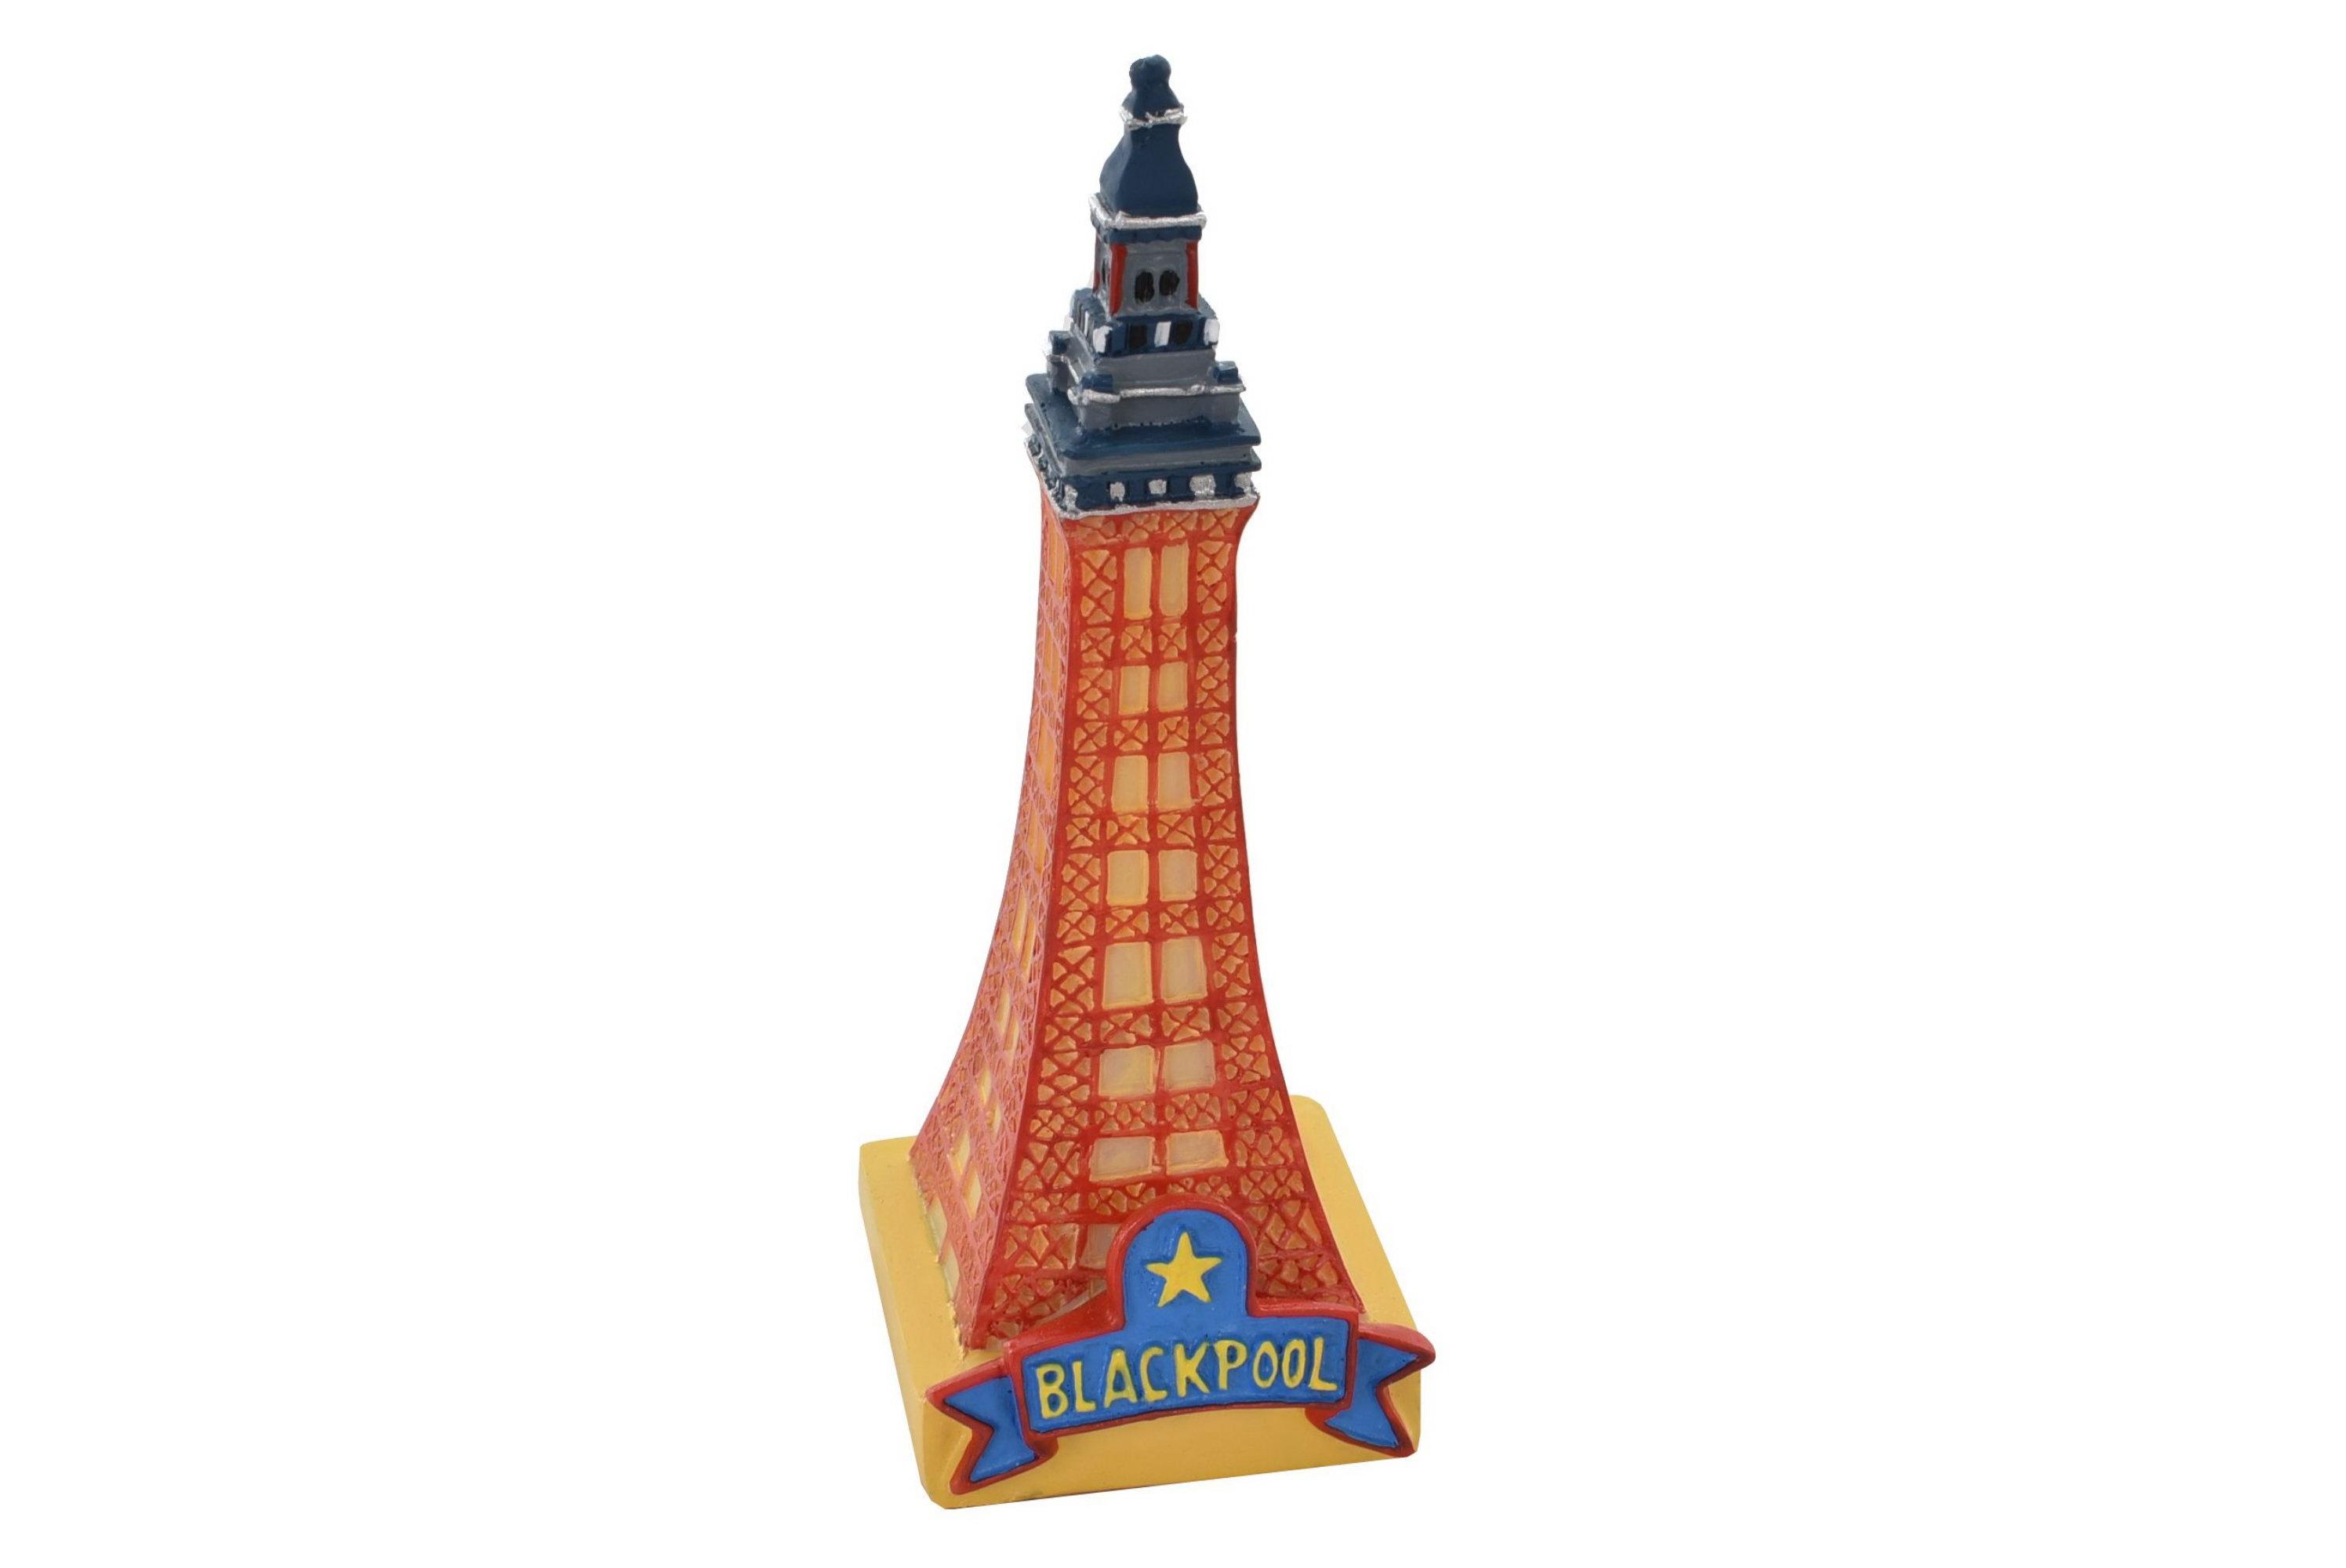 Blackpool Resin Tower 9cm